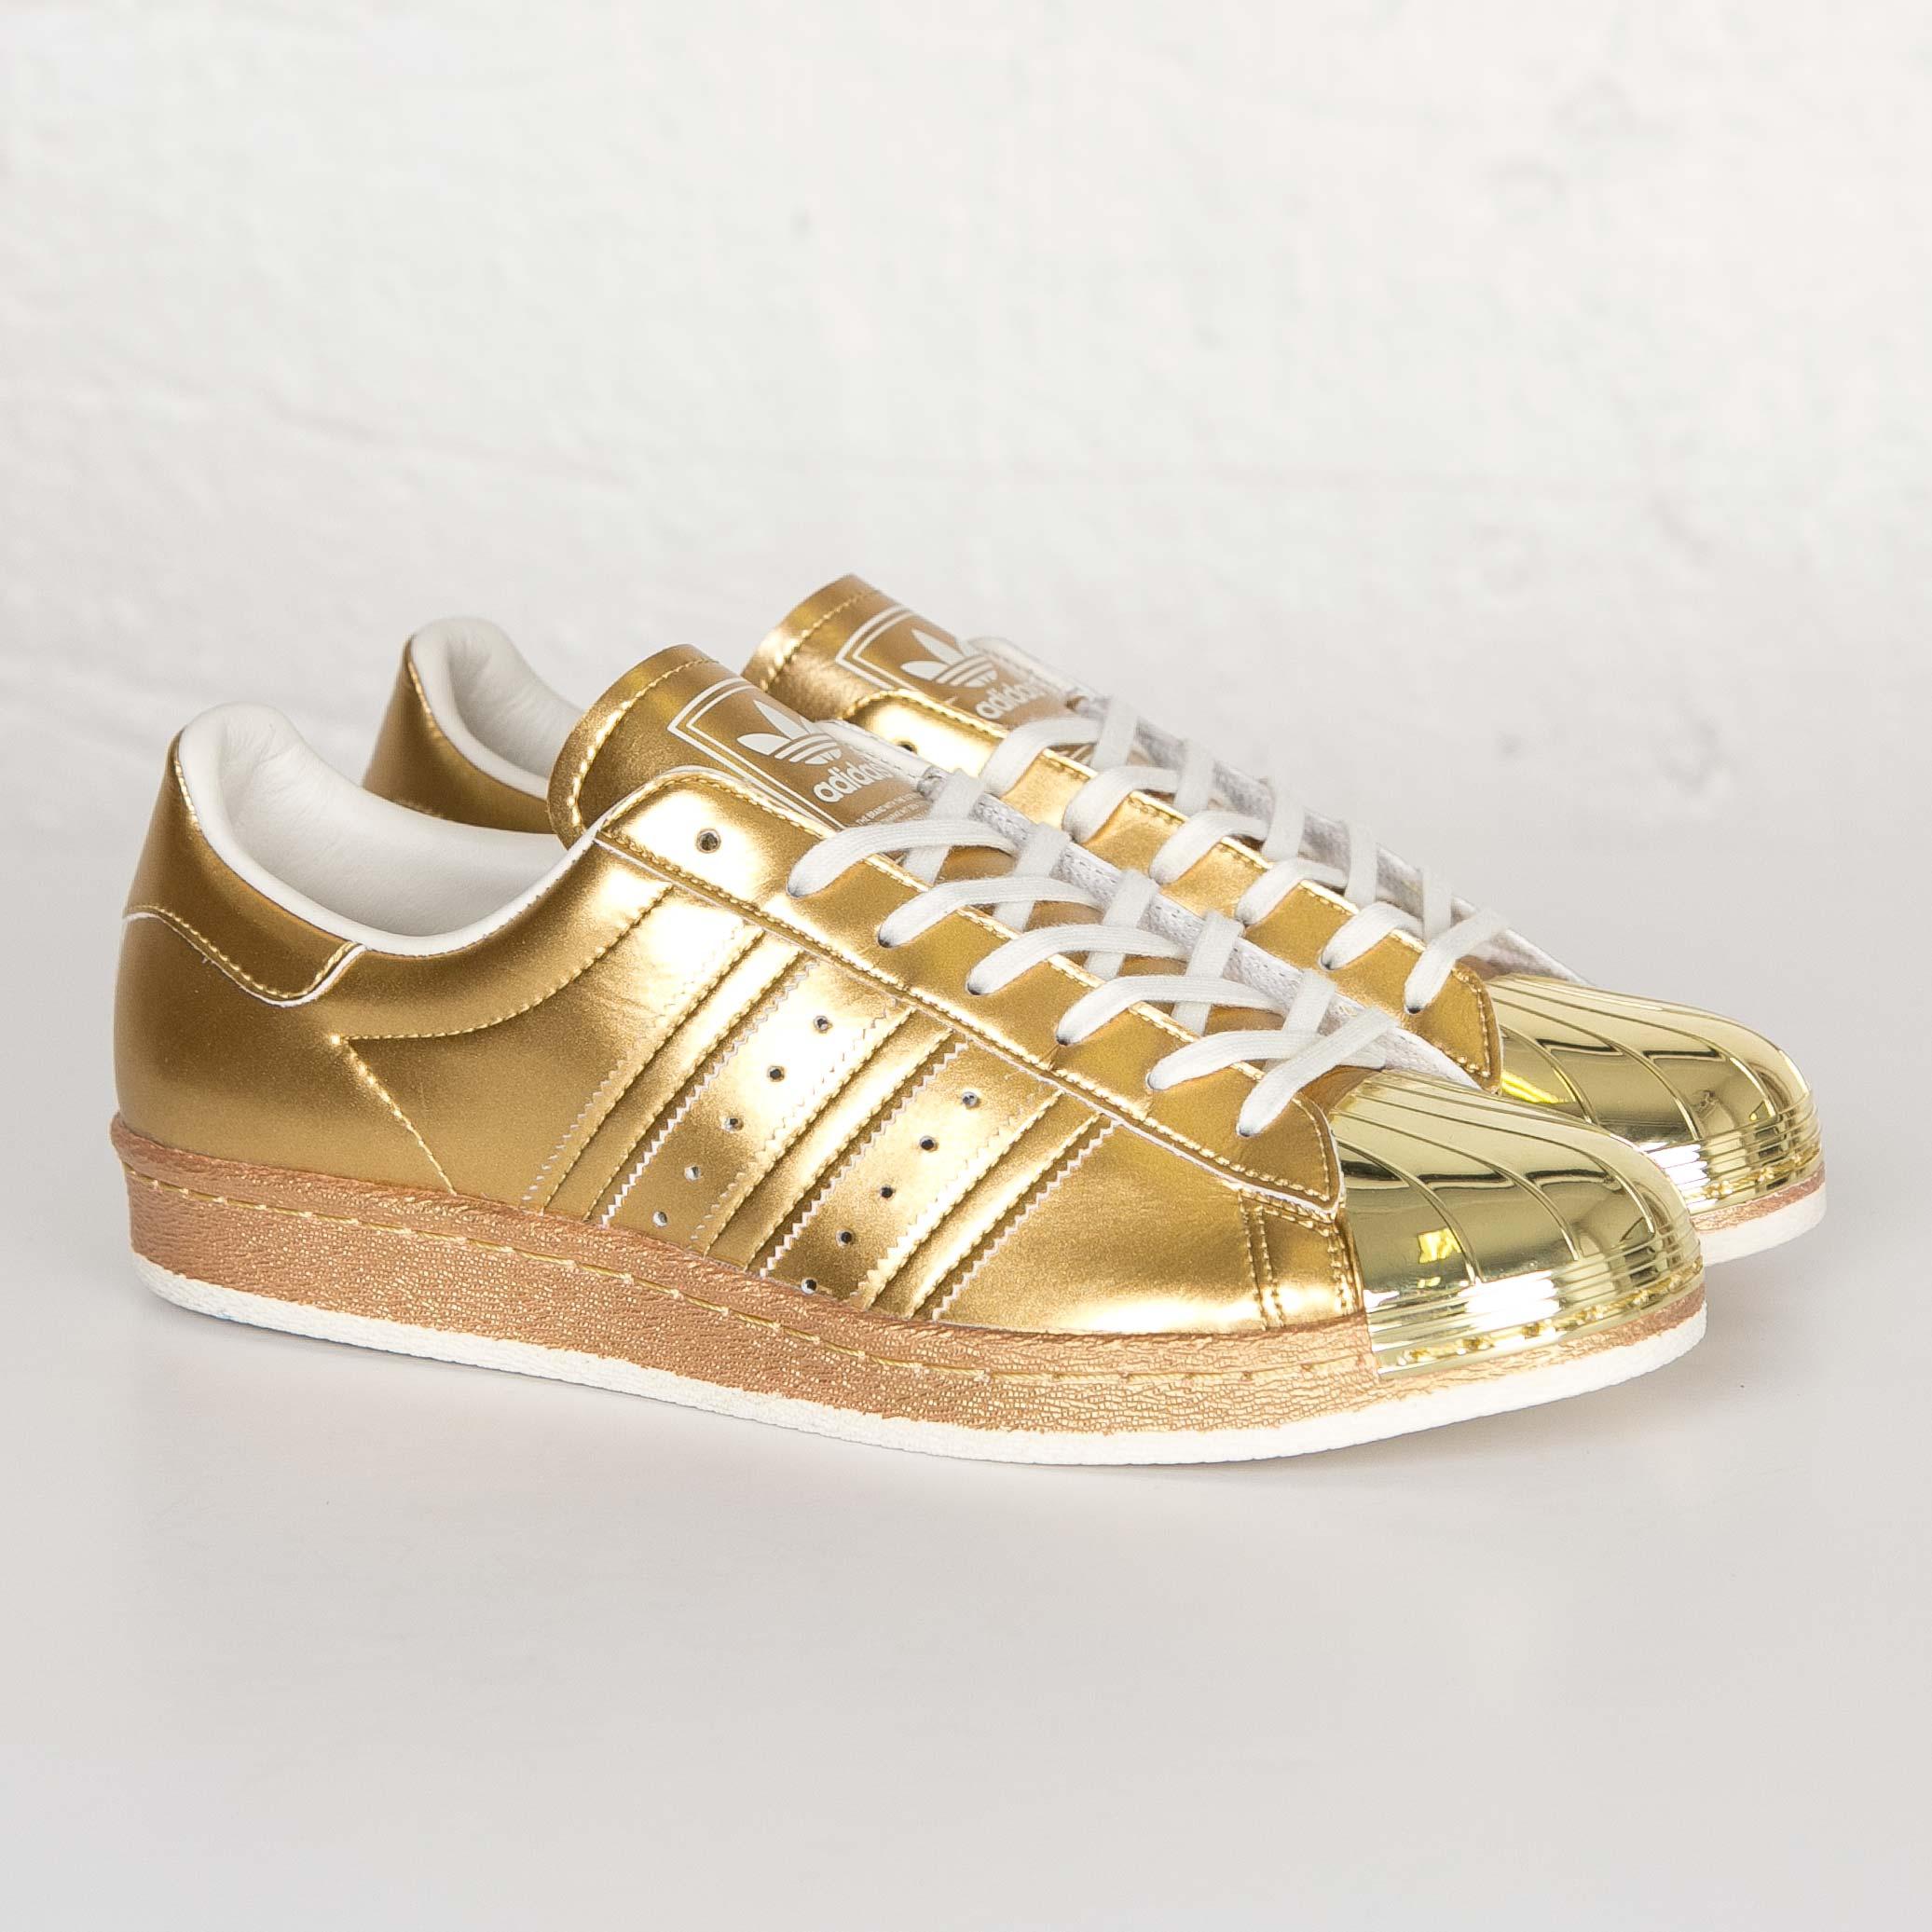 adidas Superstar 80s Metallic Pack - S82742 - SNS | sneakers ...